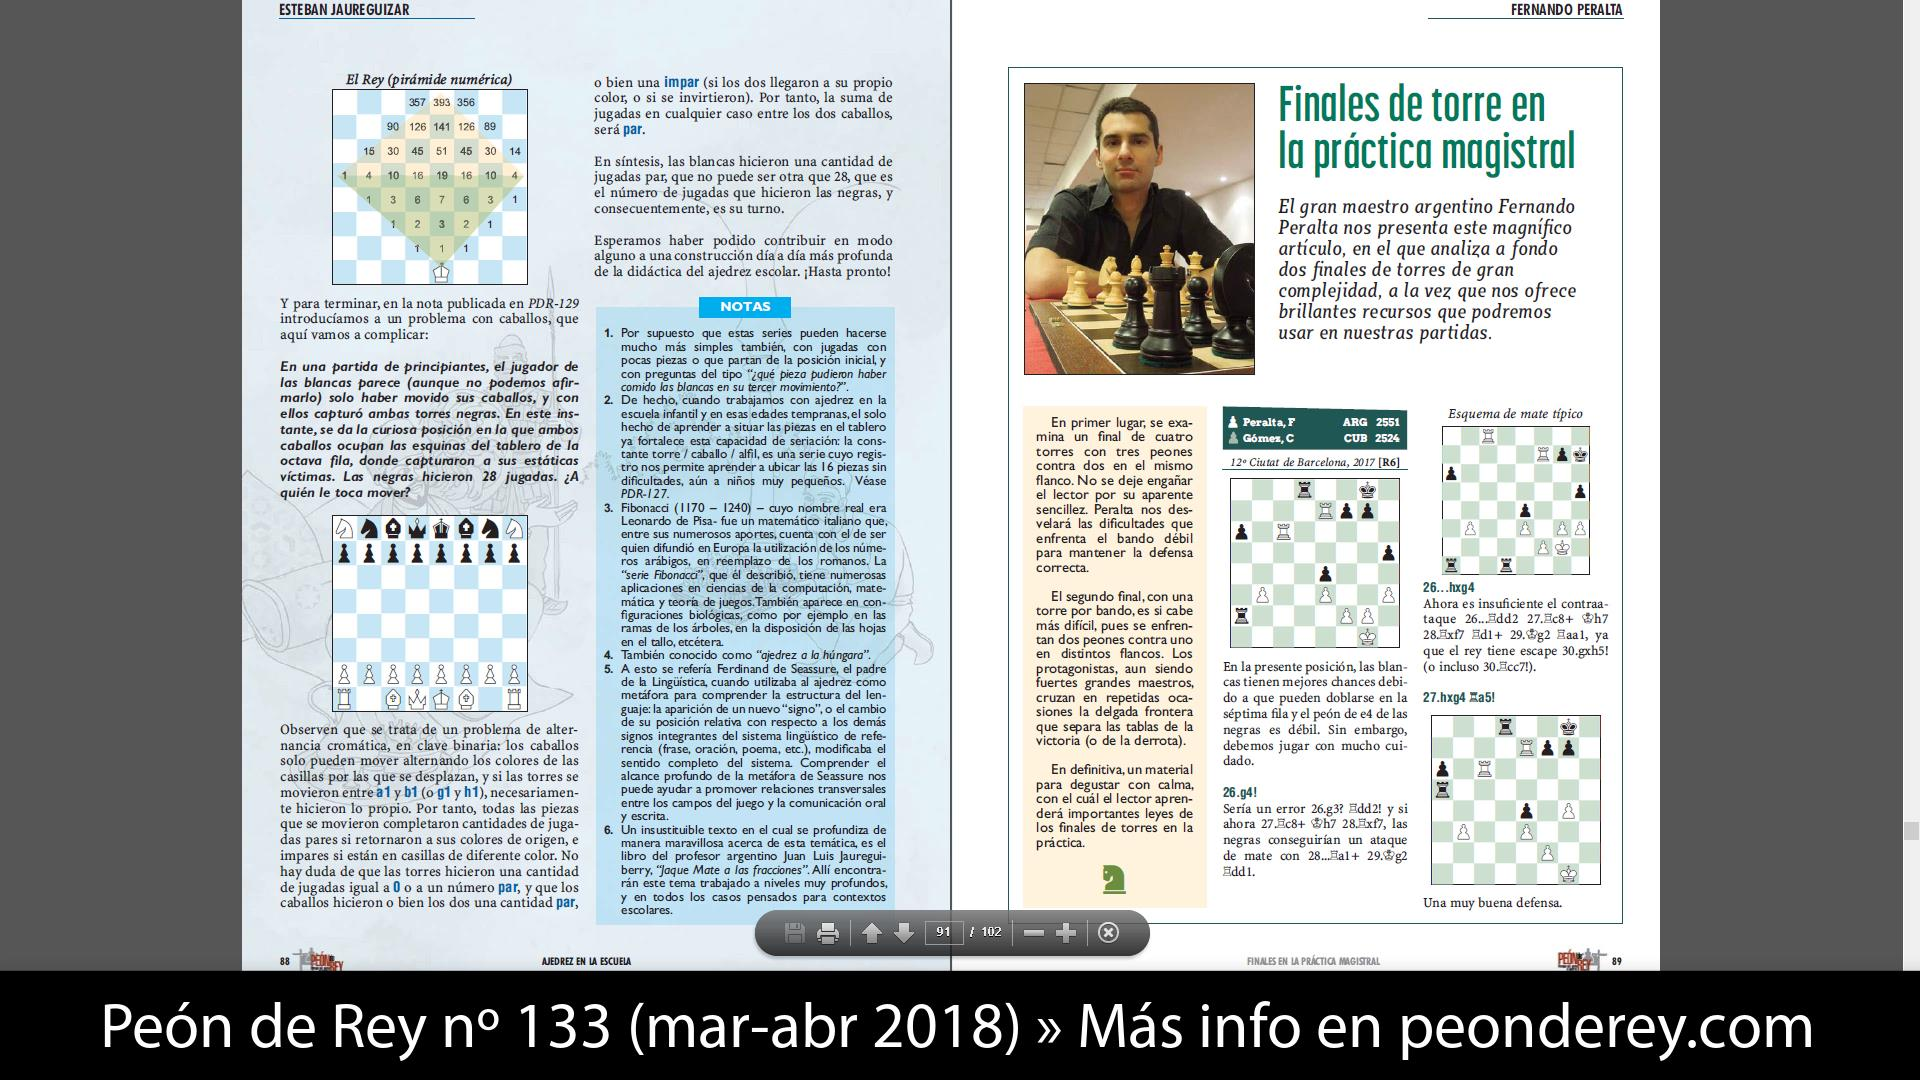 Finales Magistrales del GM Peralta (PDR-133 - GM Miguel Illescas)